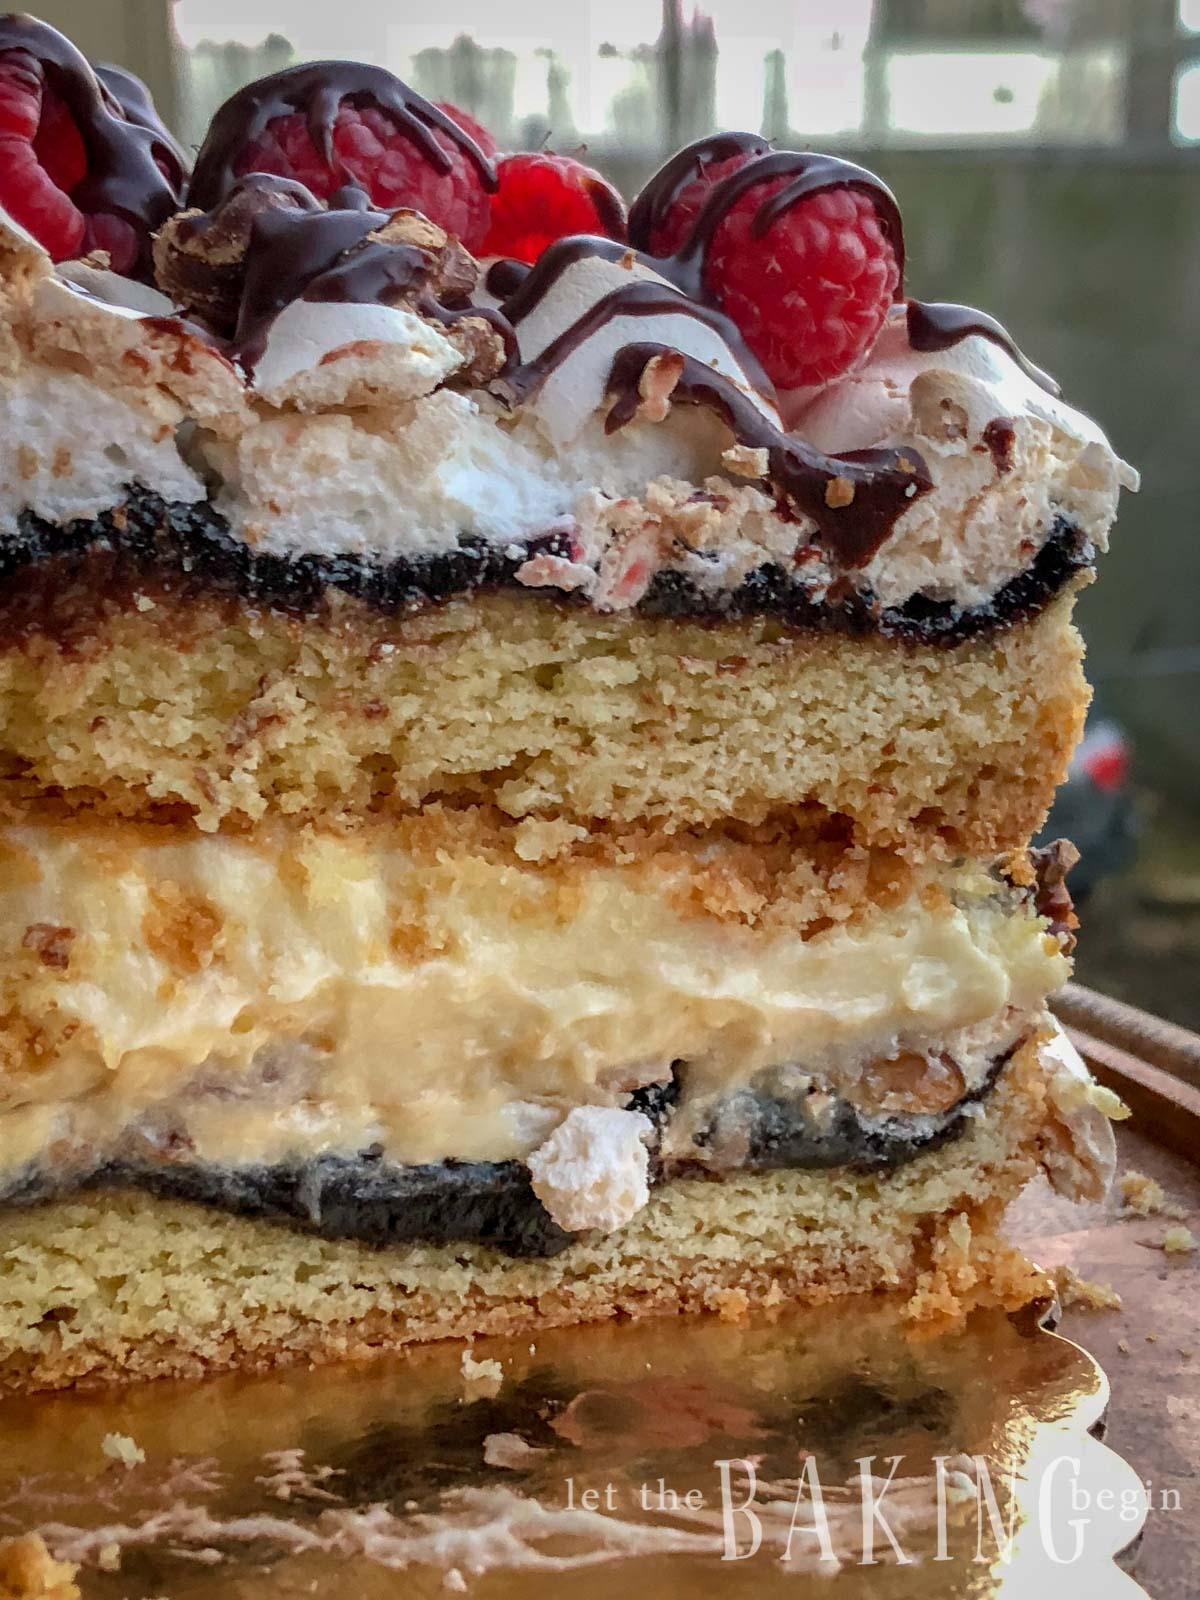 Popular Polish Cake made with Shortbread cake layers, plum jam, meringue, walnuts and custard.